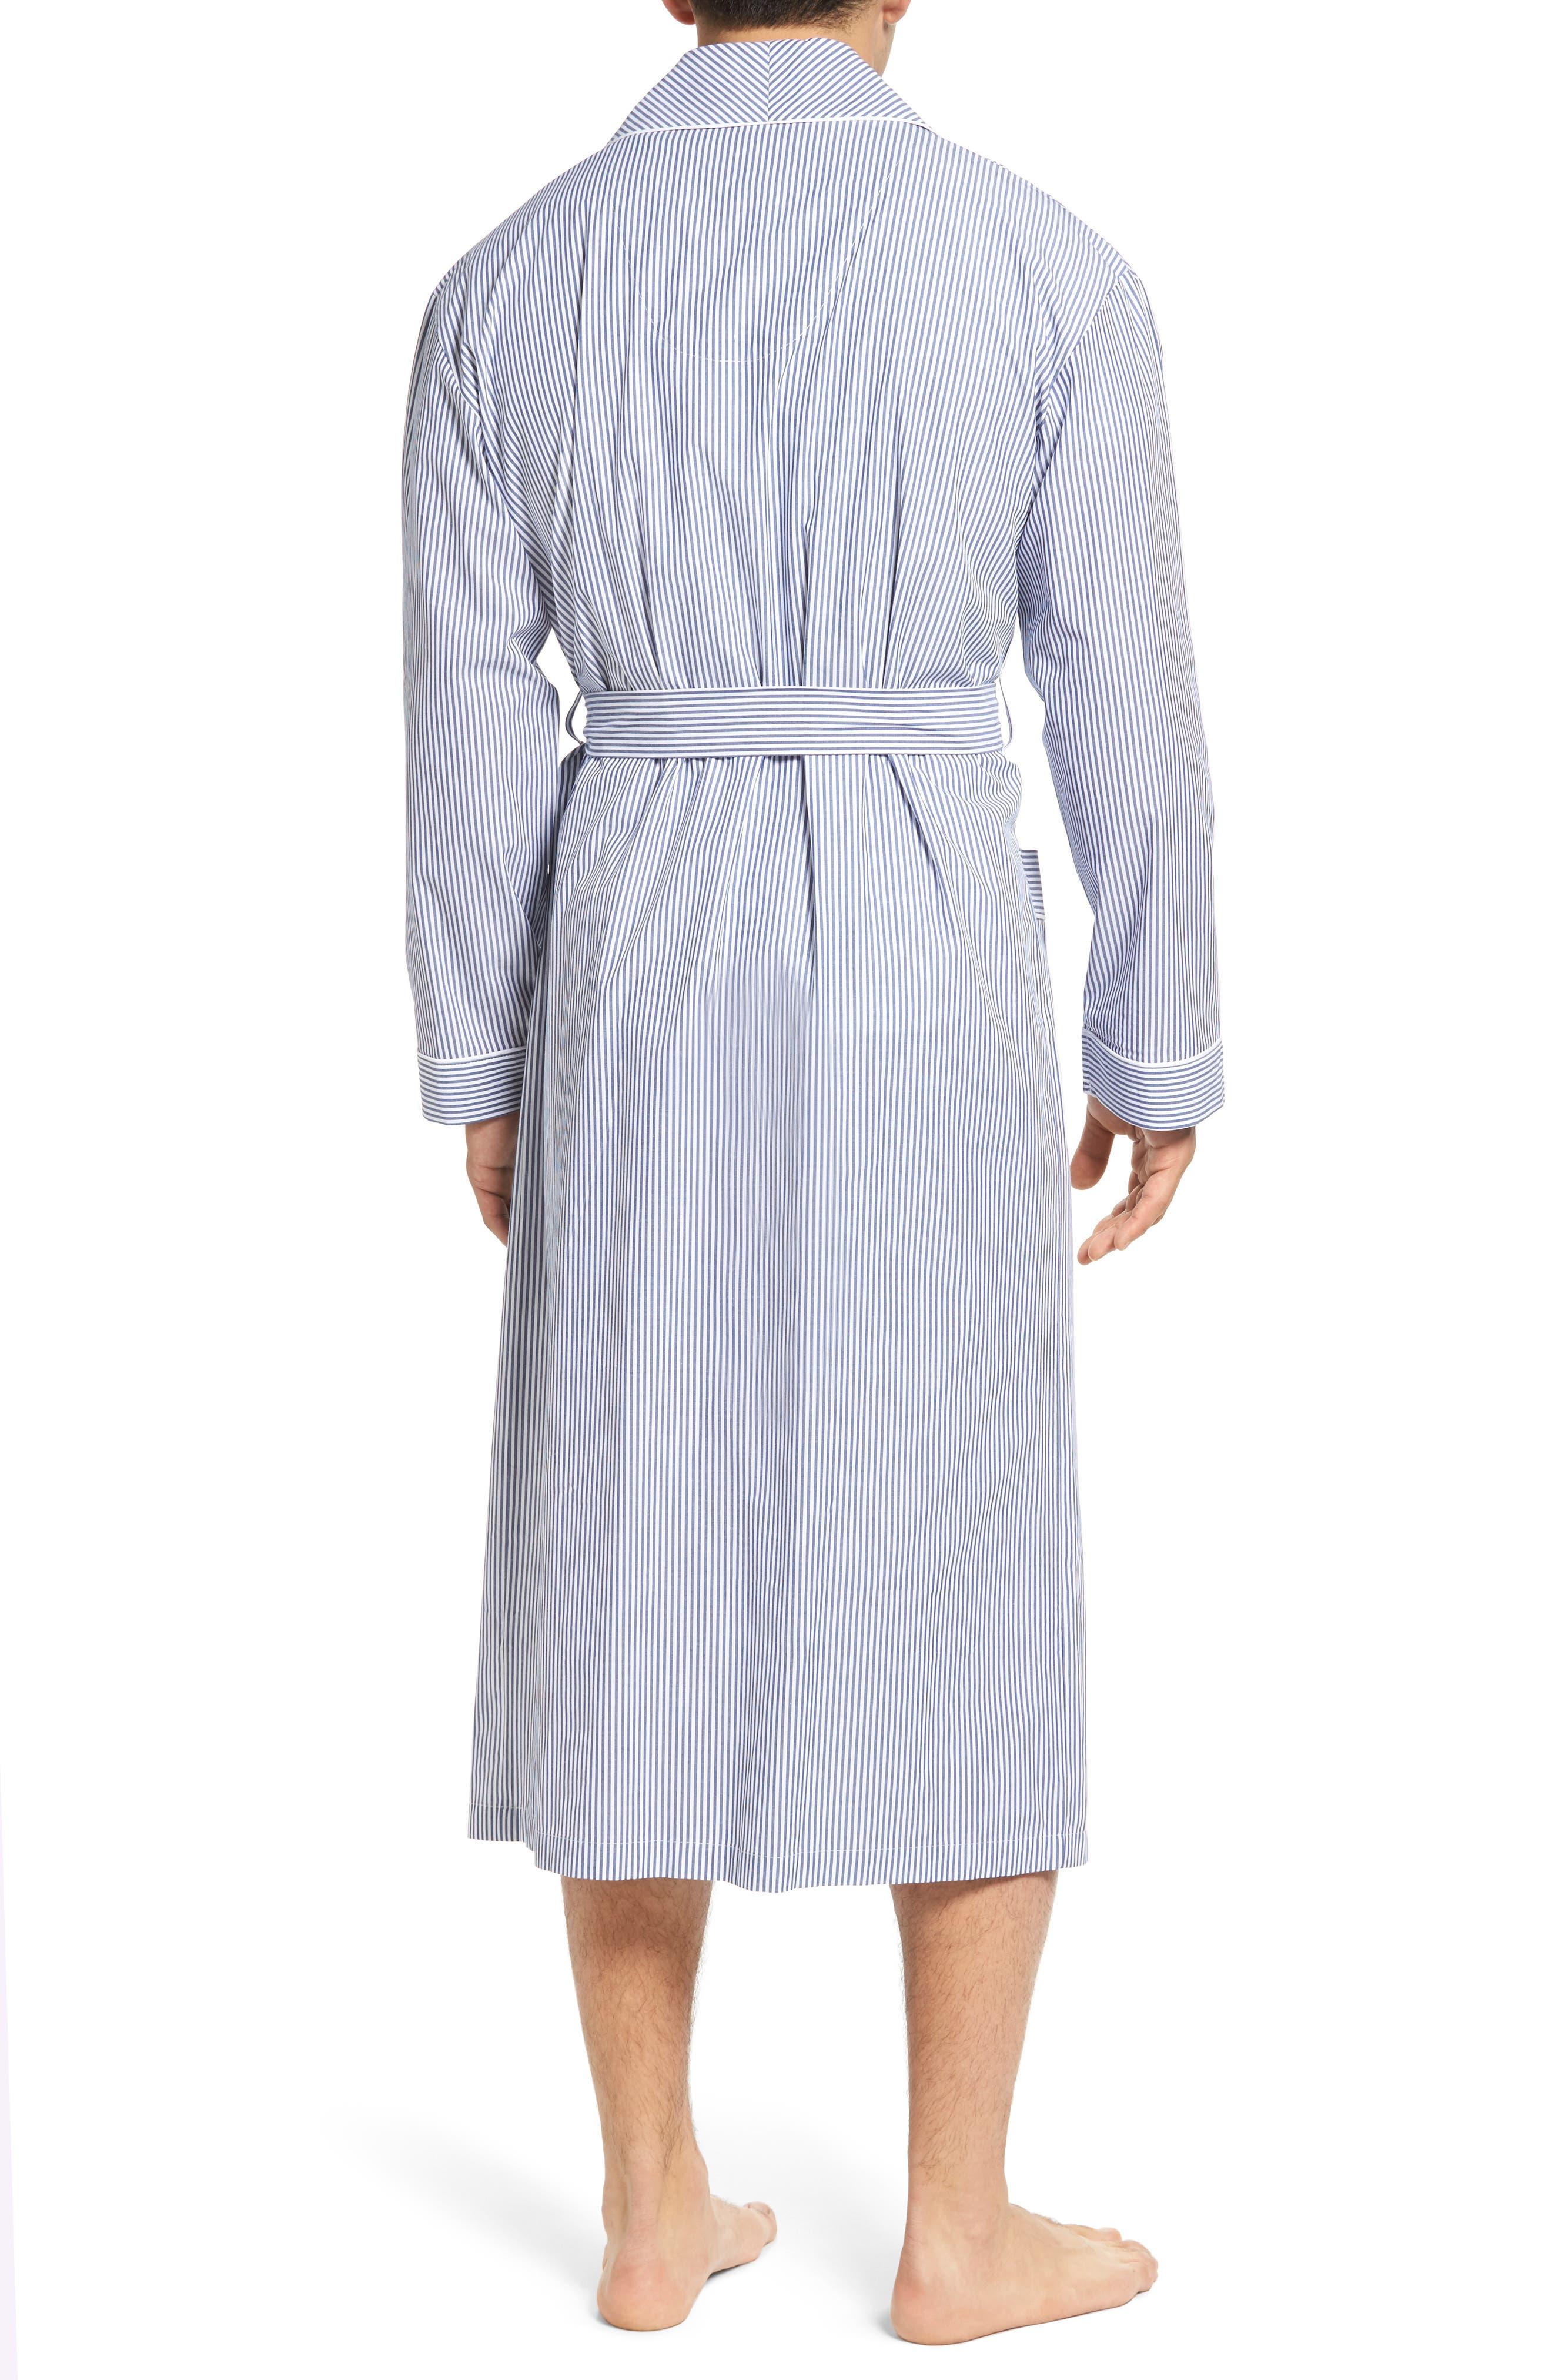 Bengal Stripe Robe,                             Alternate thumbnail 2, color,                             NAVY/ WHITE